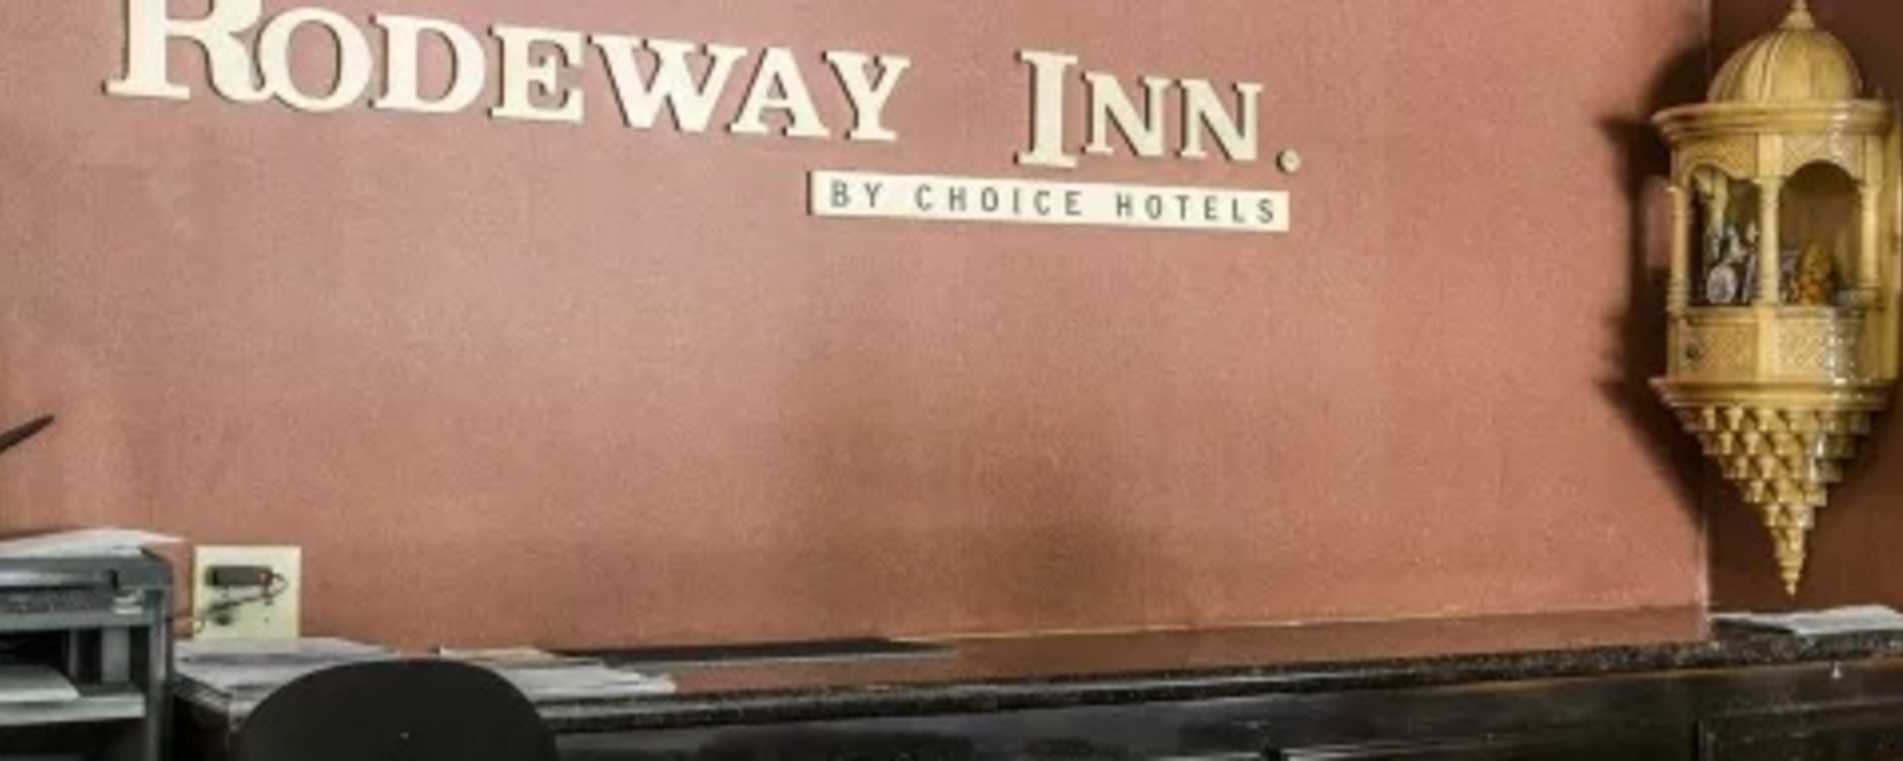 Roadway Inn Front Desk